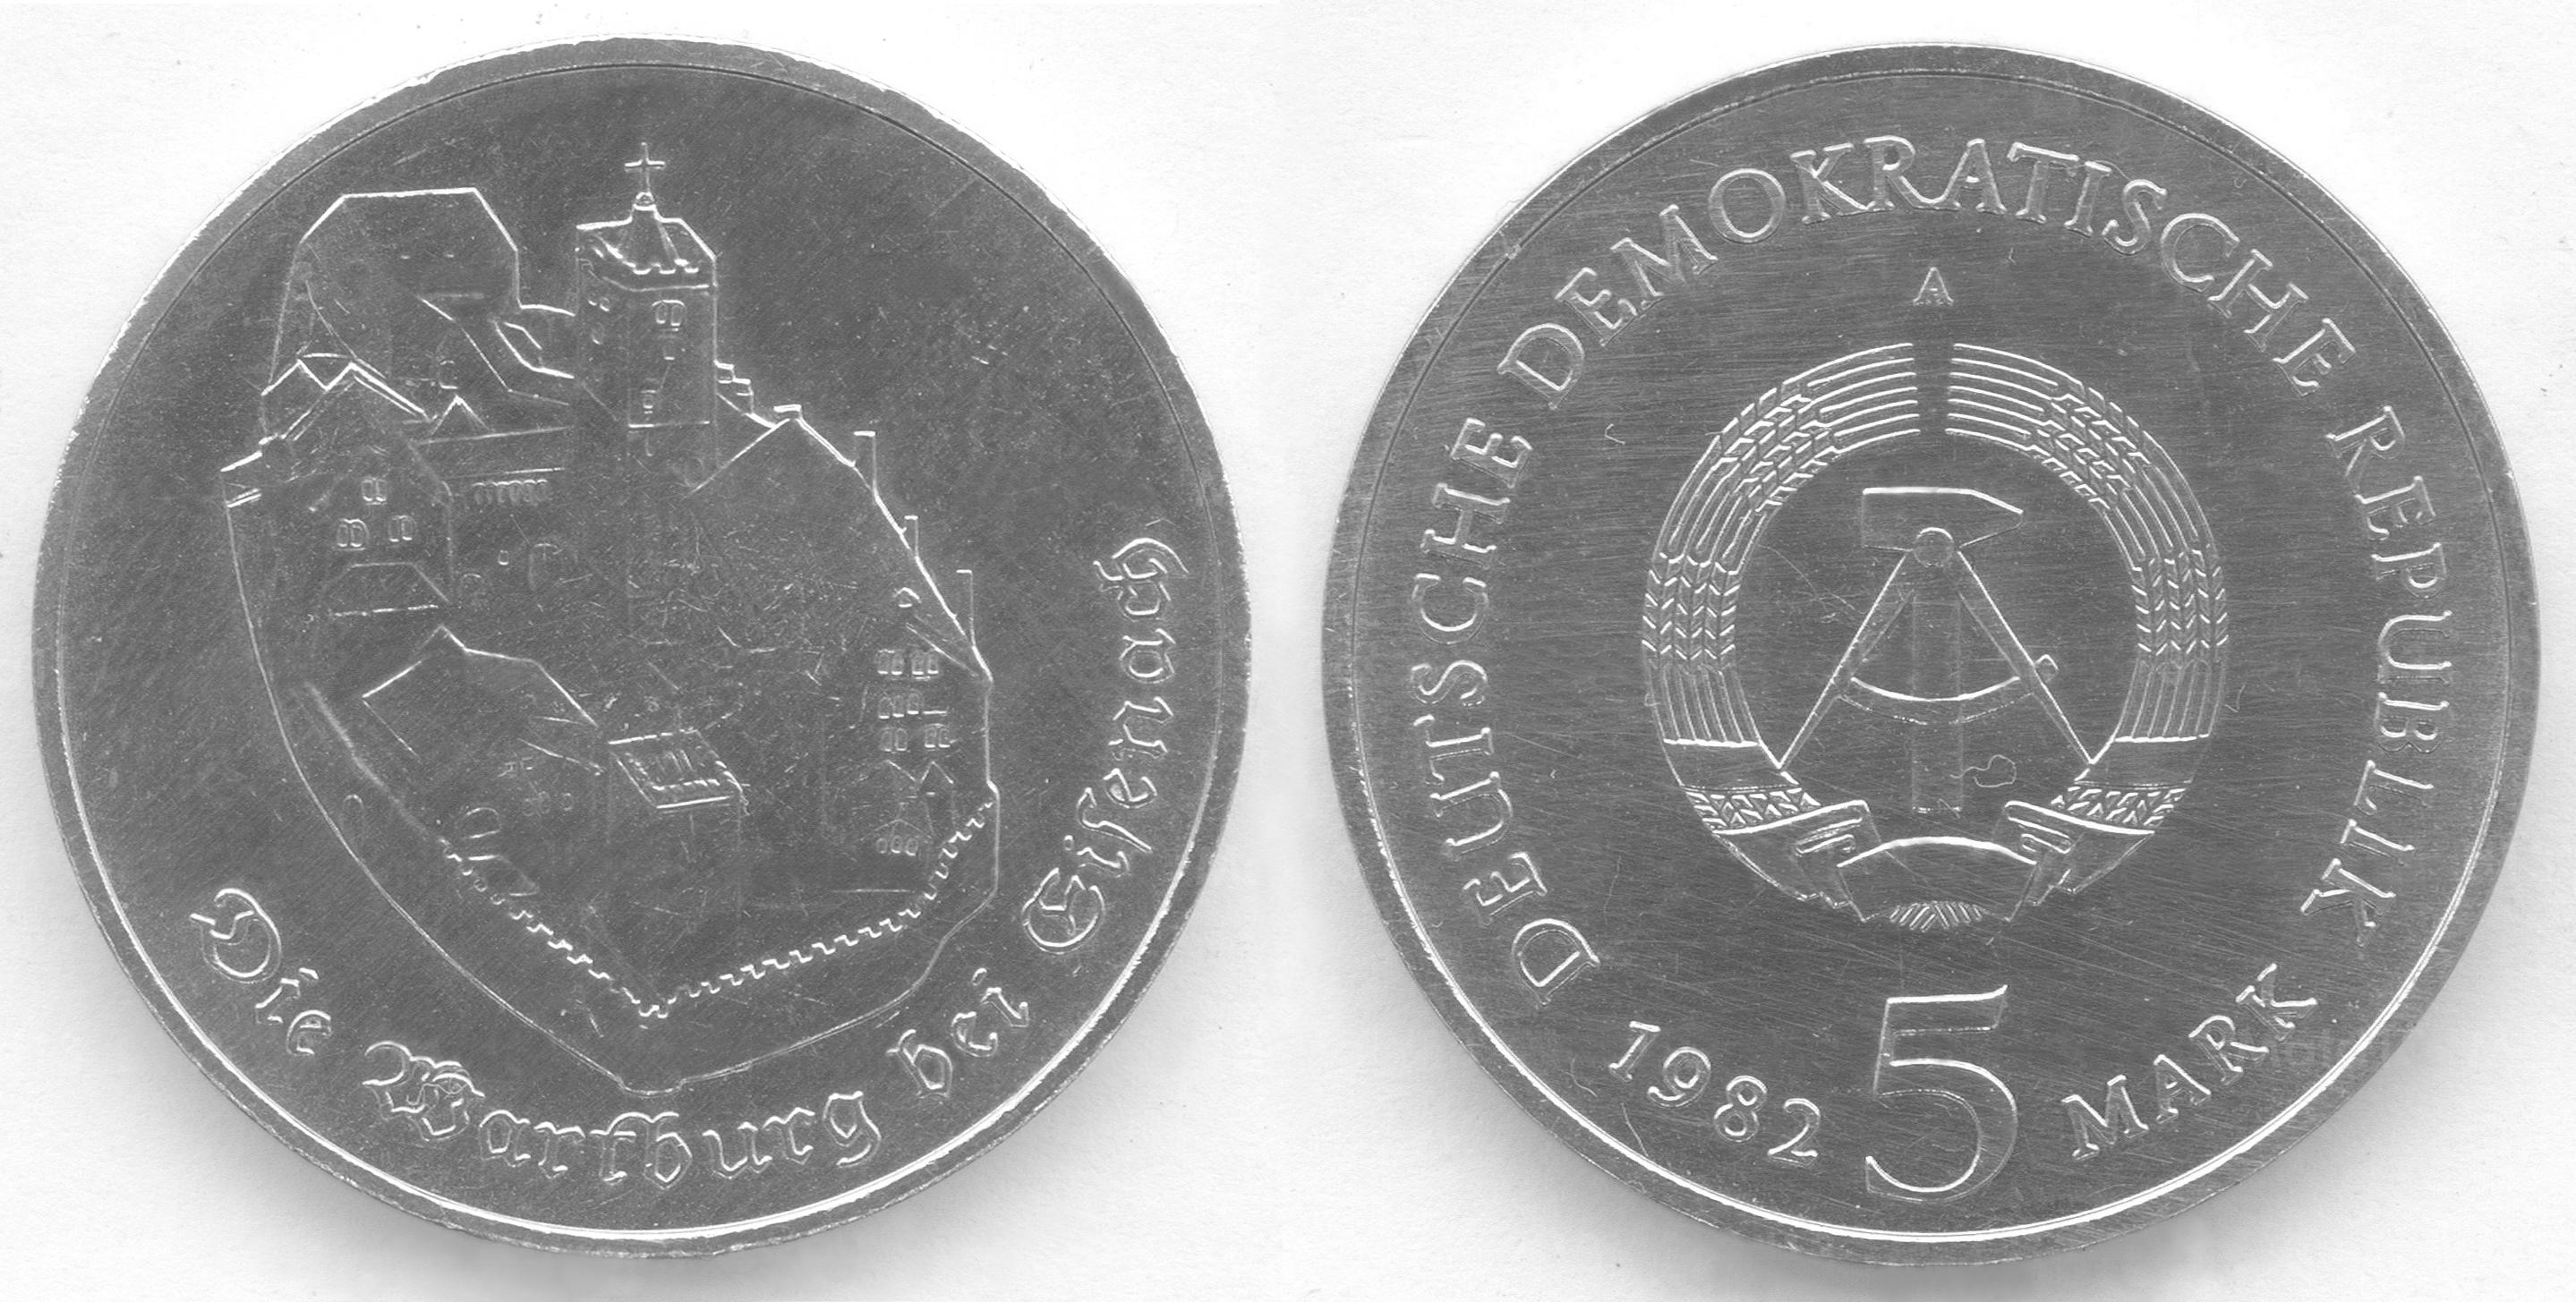 ... mm die silber gedenkmünzen chinas avers zheng he revers bwin zurückziehen Bonus bwin wetten app staatswappen